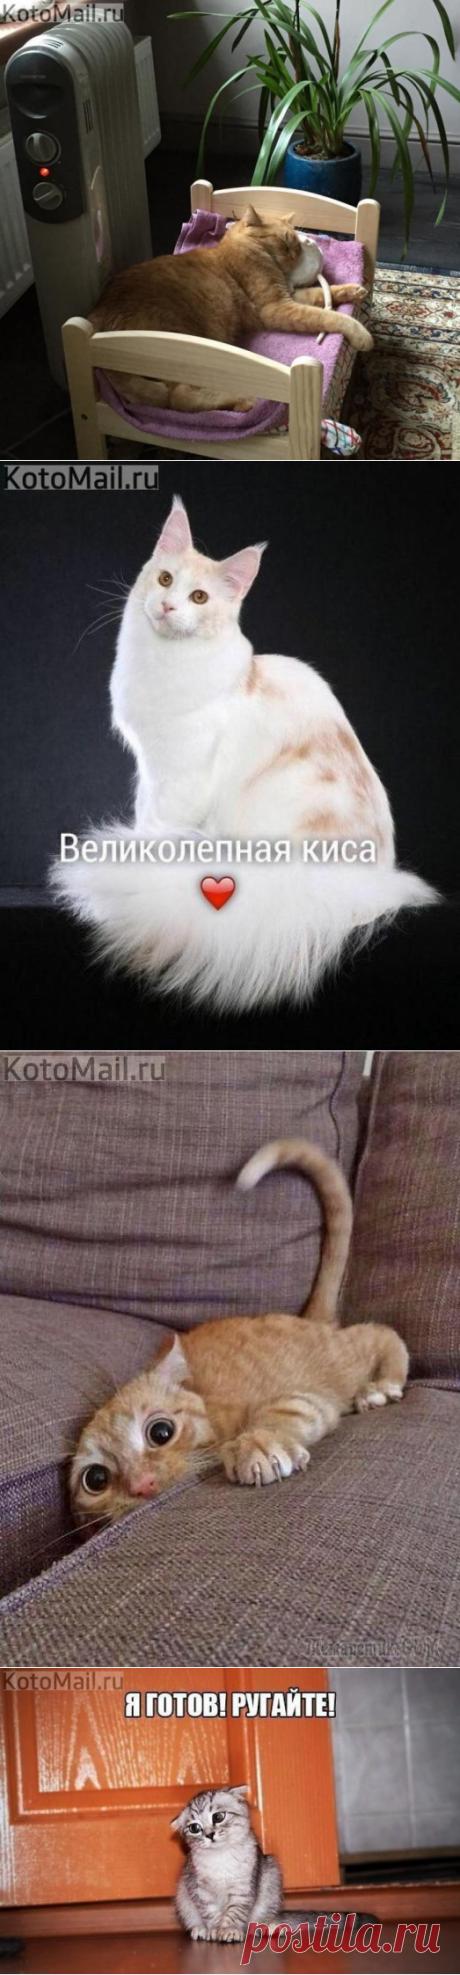 Осенний кот | KotoMail.ru